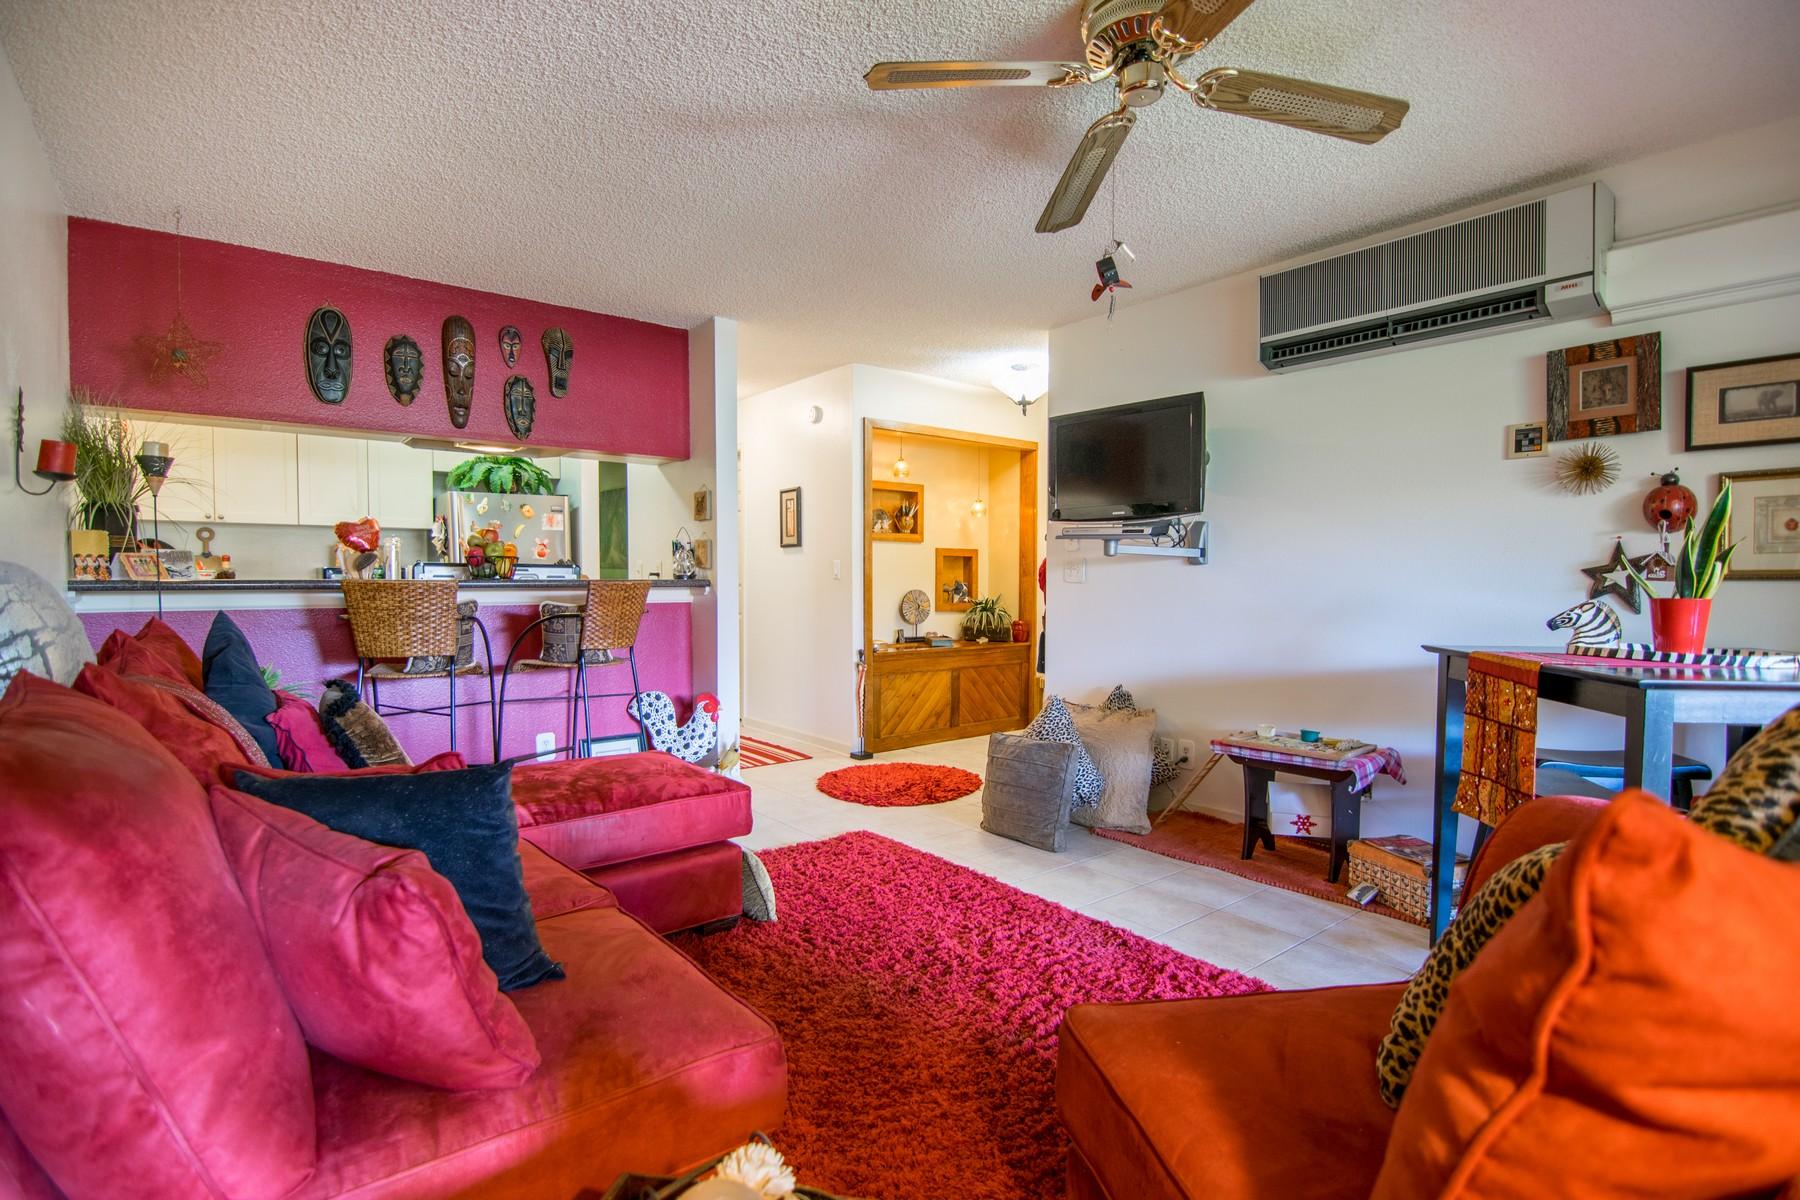 Кооперативная квартира для того Продажа на One Bedroom Oasis In The Heart of Kihei 1450 South Kihei Road, Maui Gardens A-205 Kihei, Гавайи, 96753 Соединенные Штаты